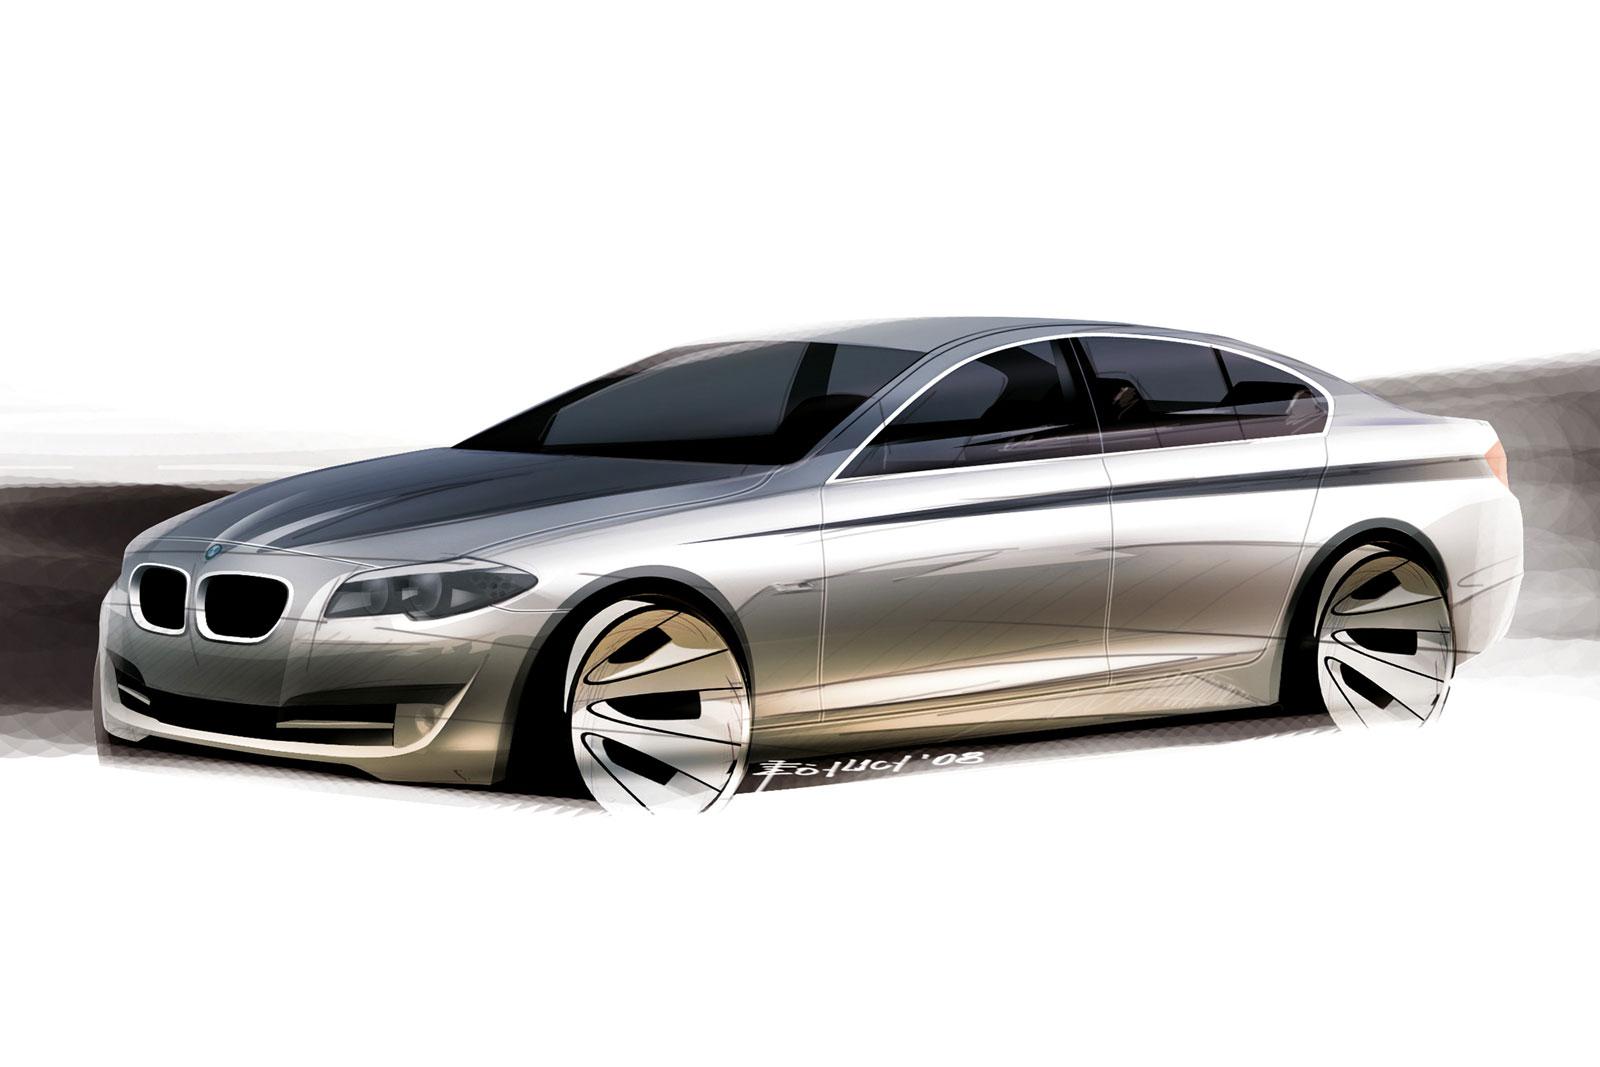 Bmw 5 Series Design Sketch Car Body Design